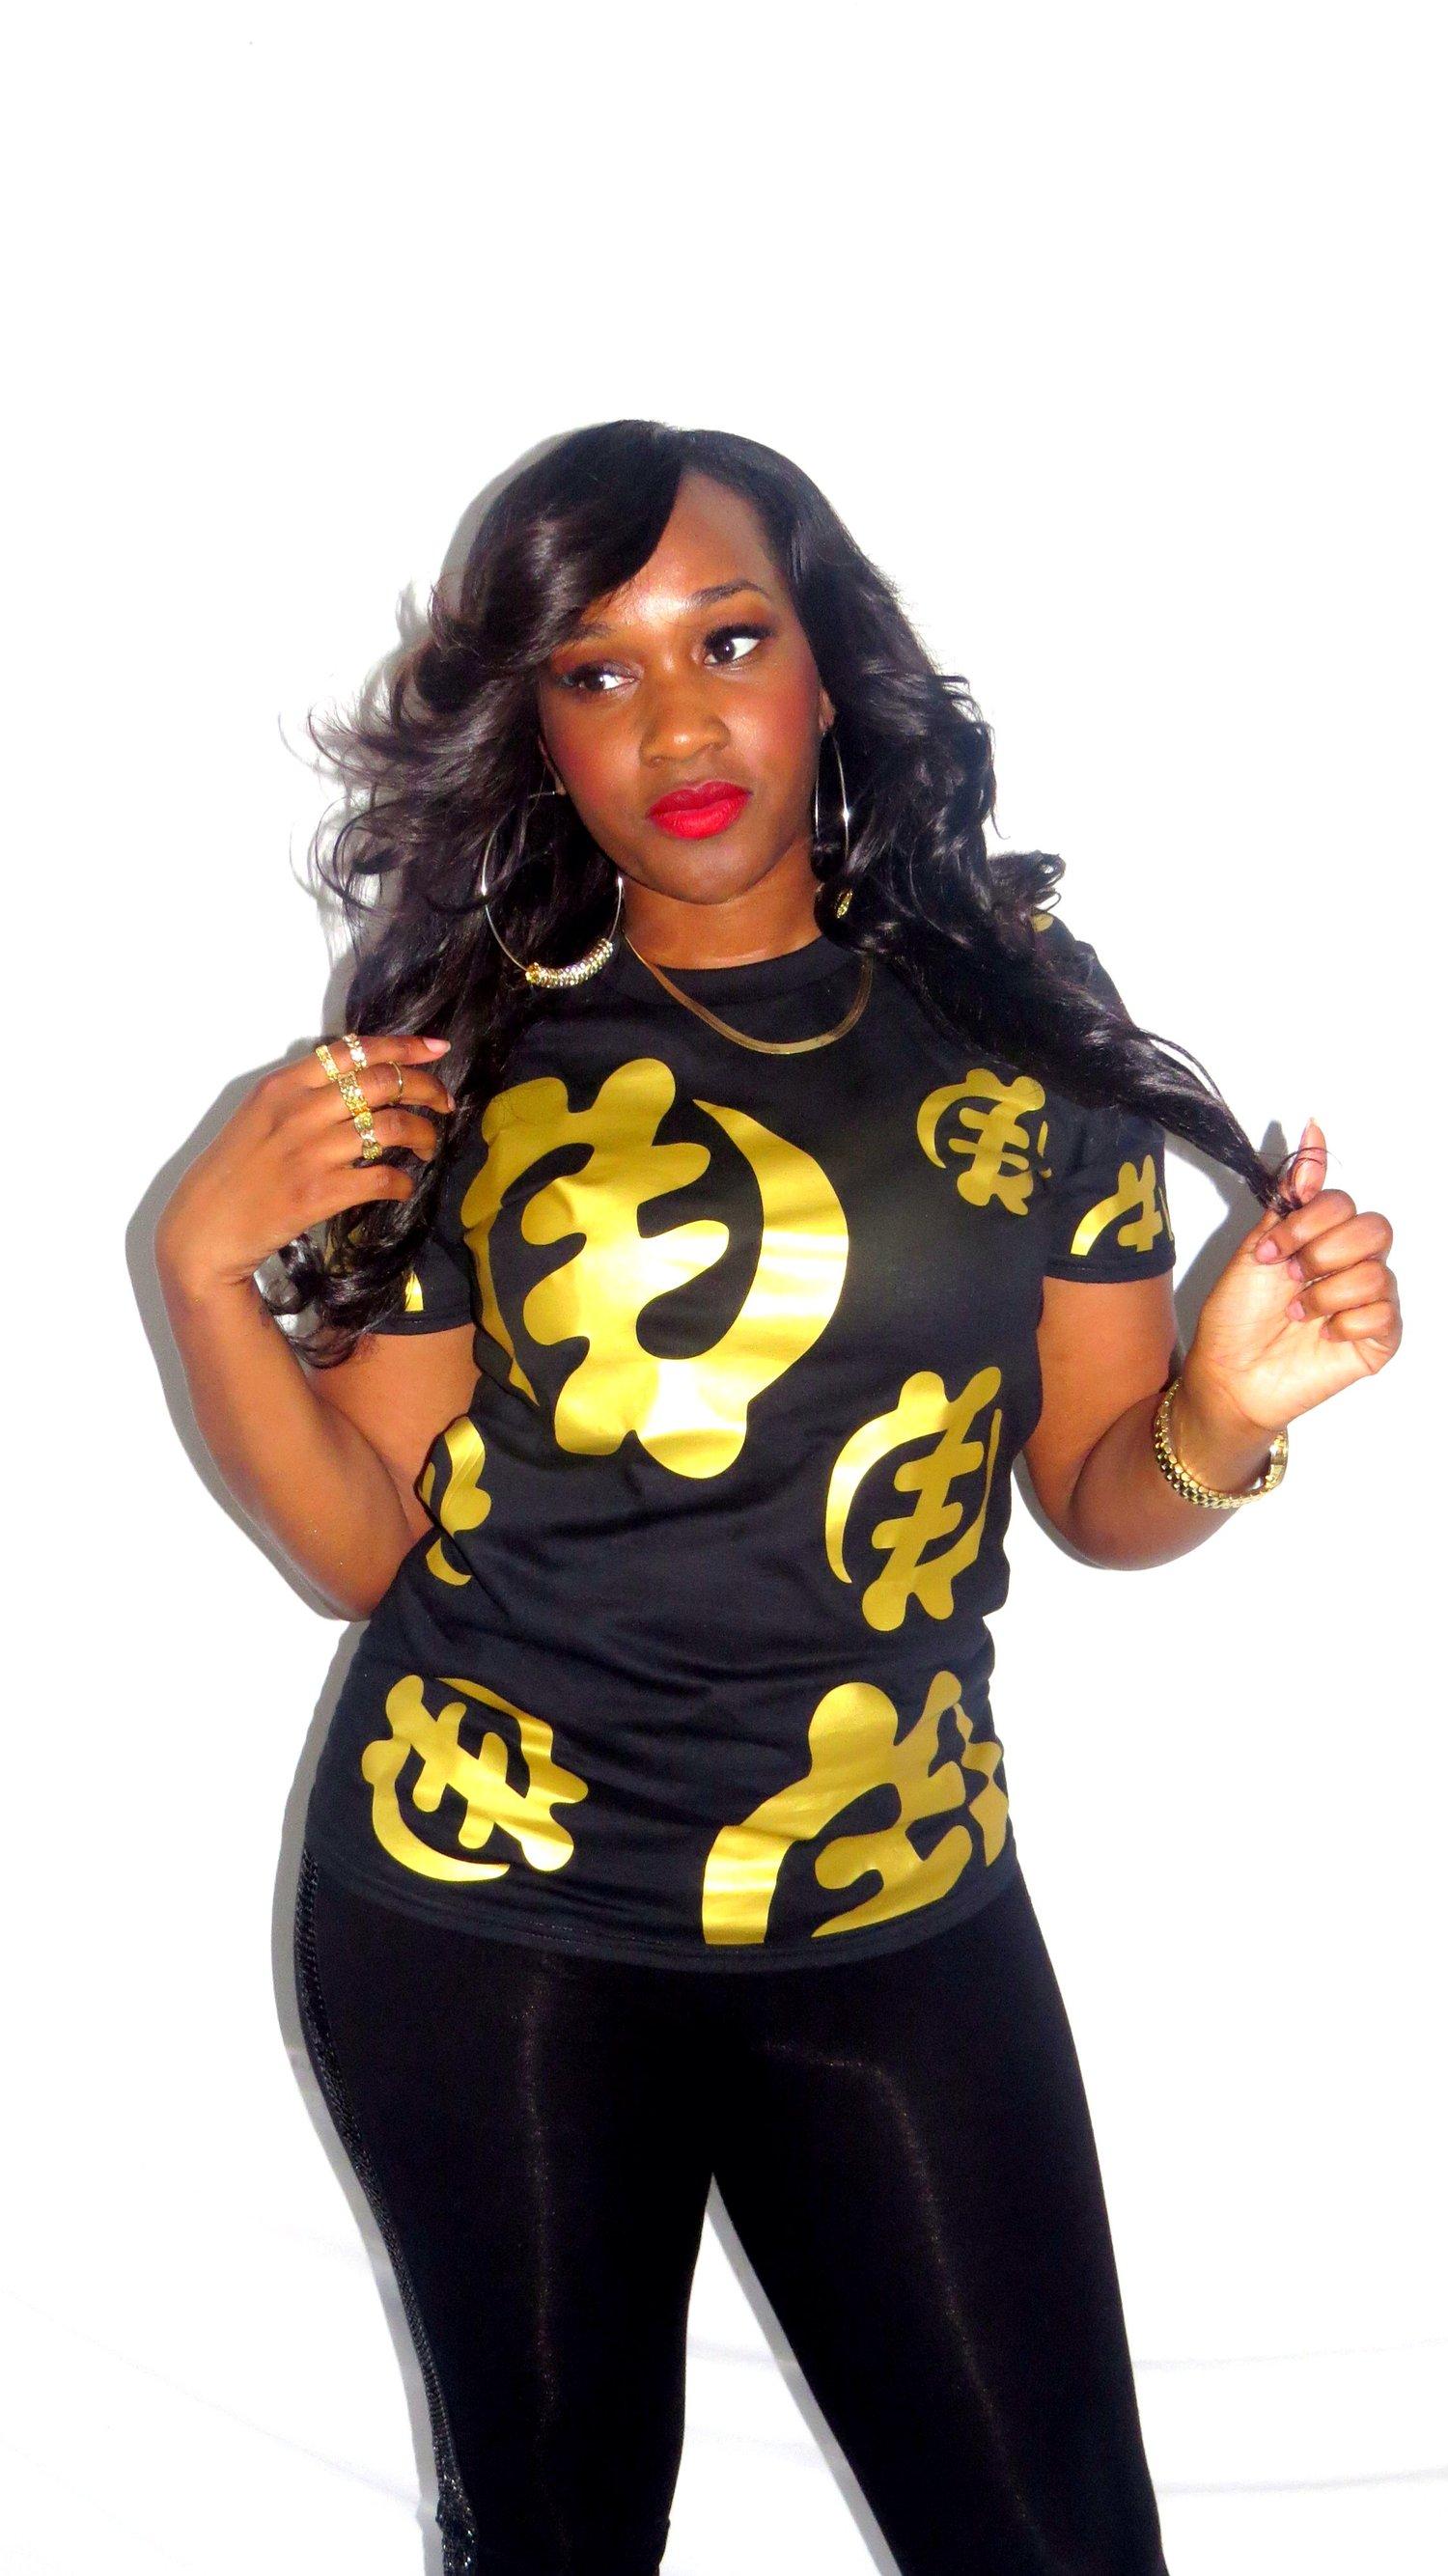 Image of Black/Gold Villi'age Tee